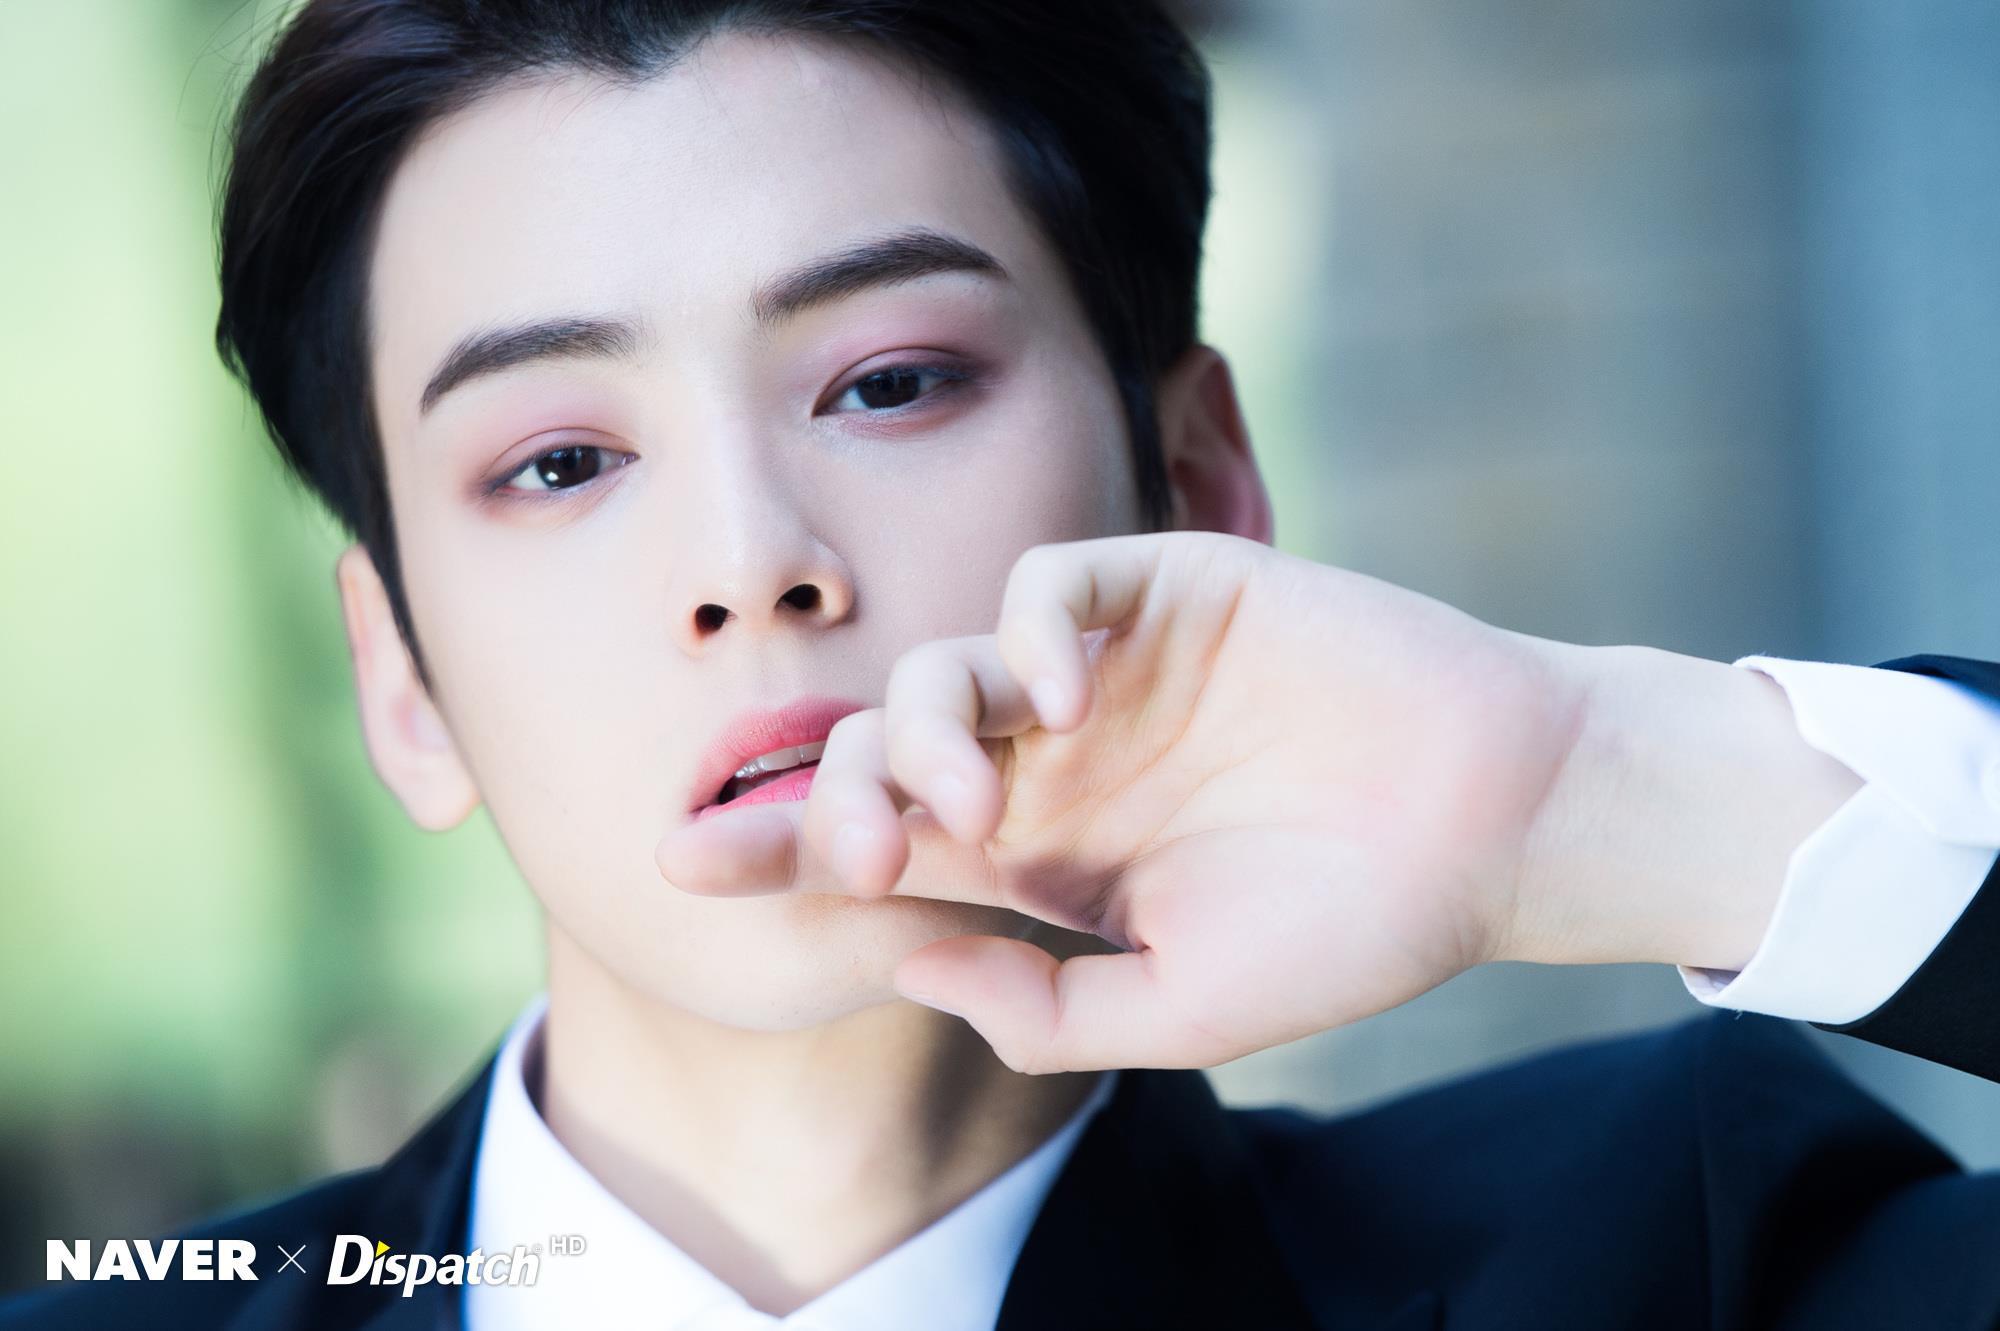 Cha EunWoo, Cha EunWoo Profile, Astro Cha EunWoo Profile